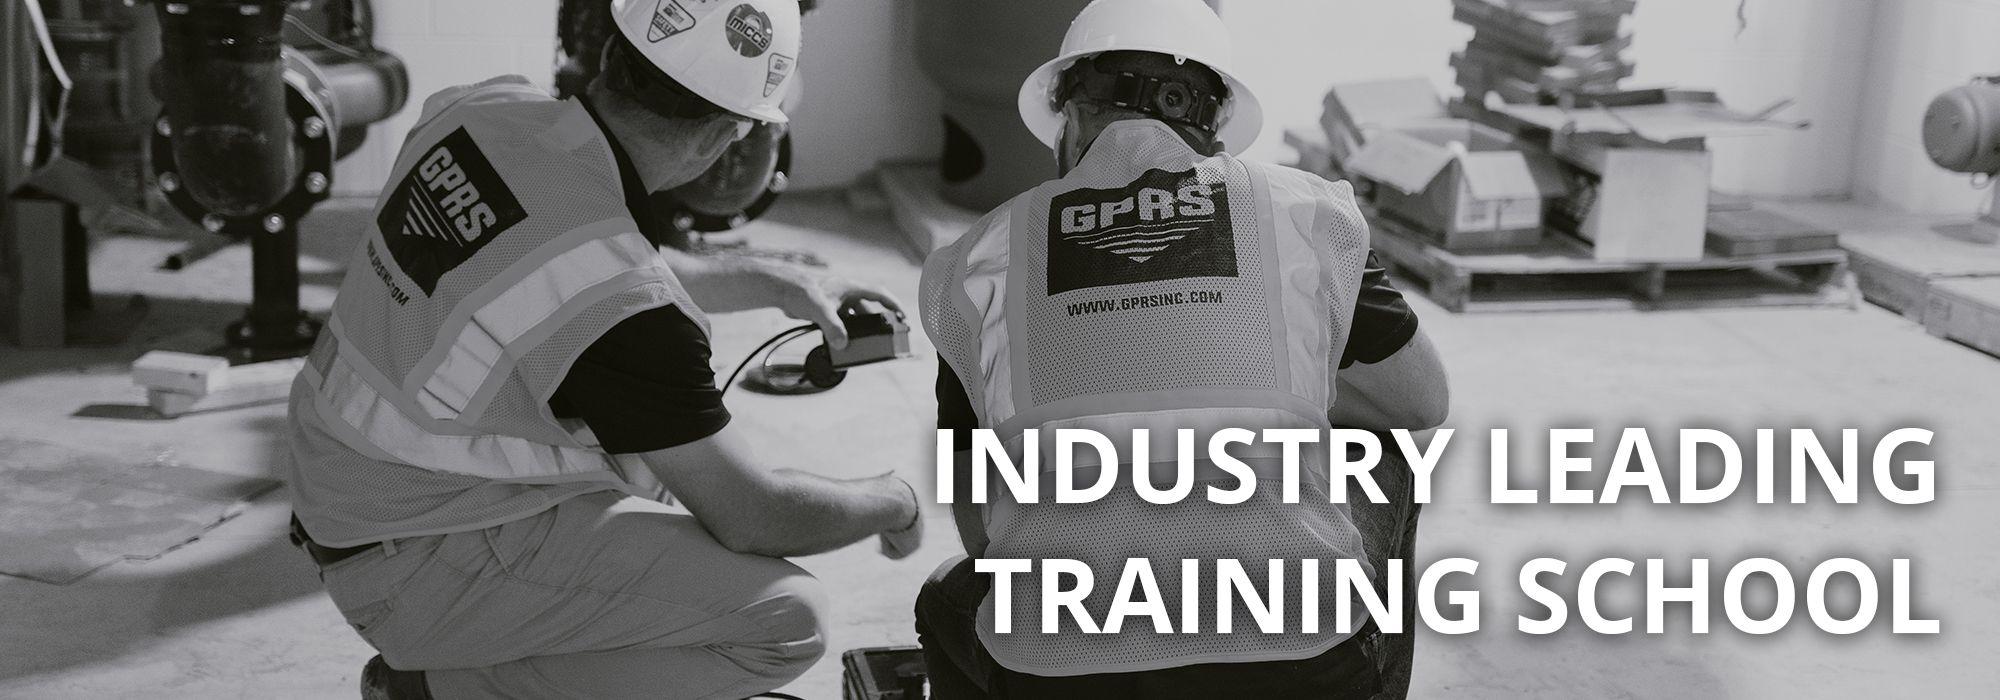 Industry Leading Training School